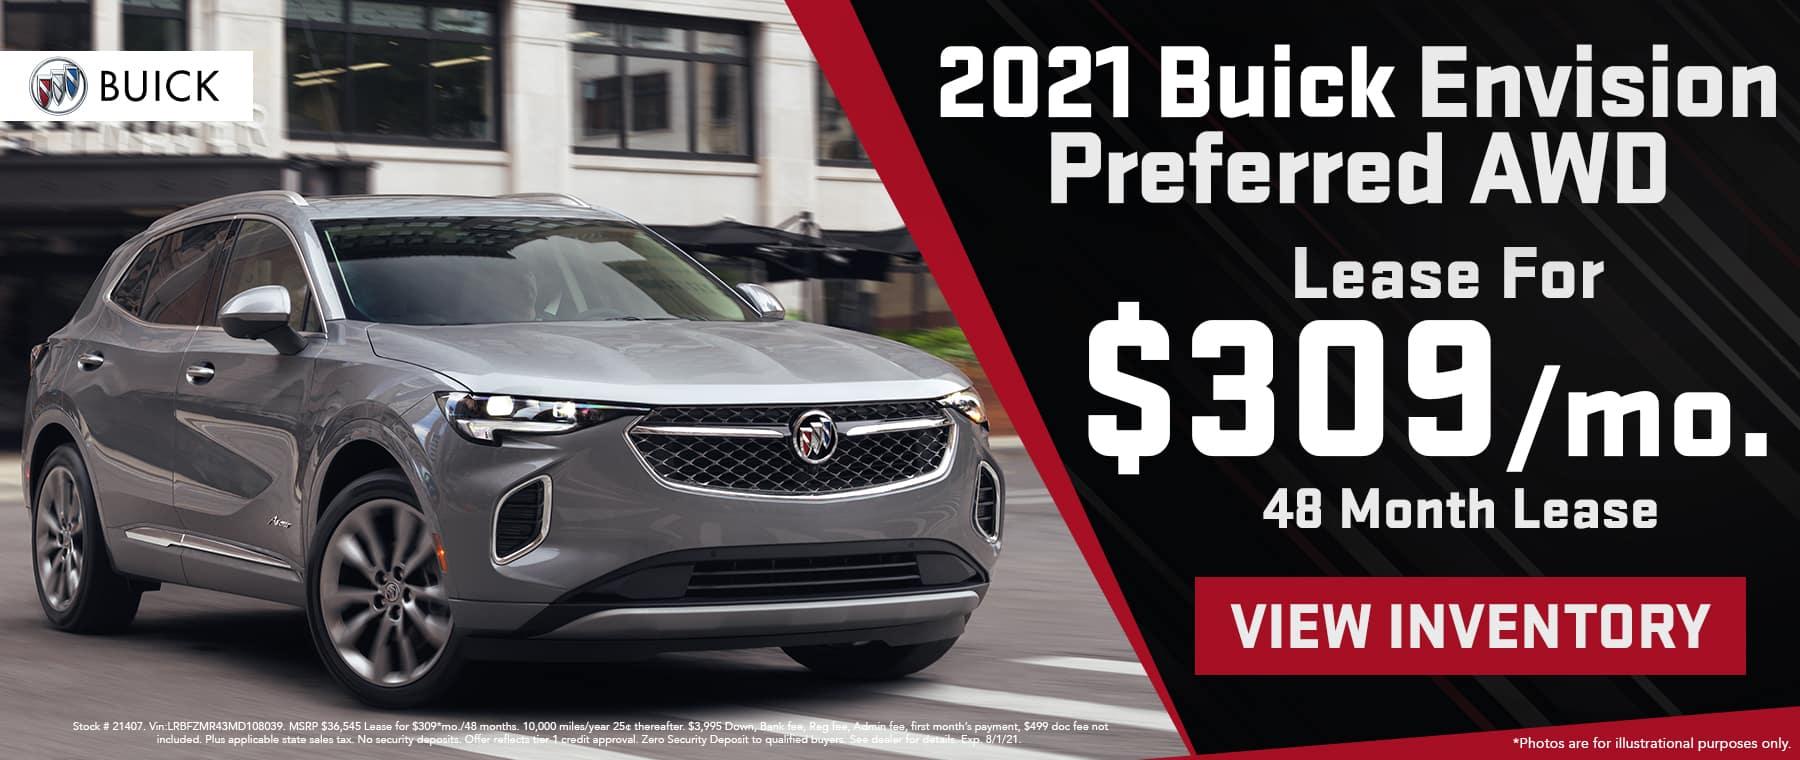 Buick Envision preffered